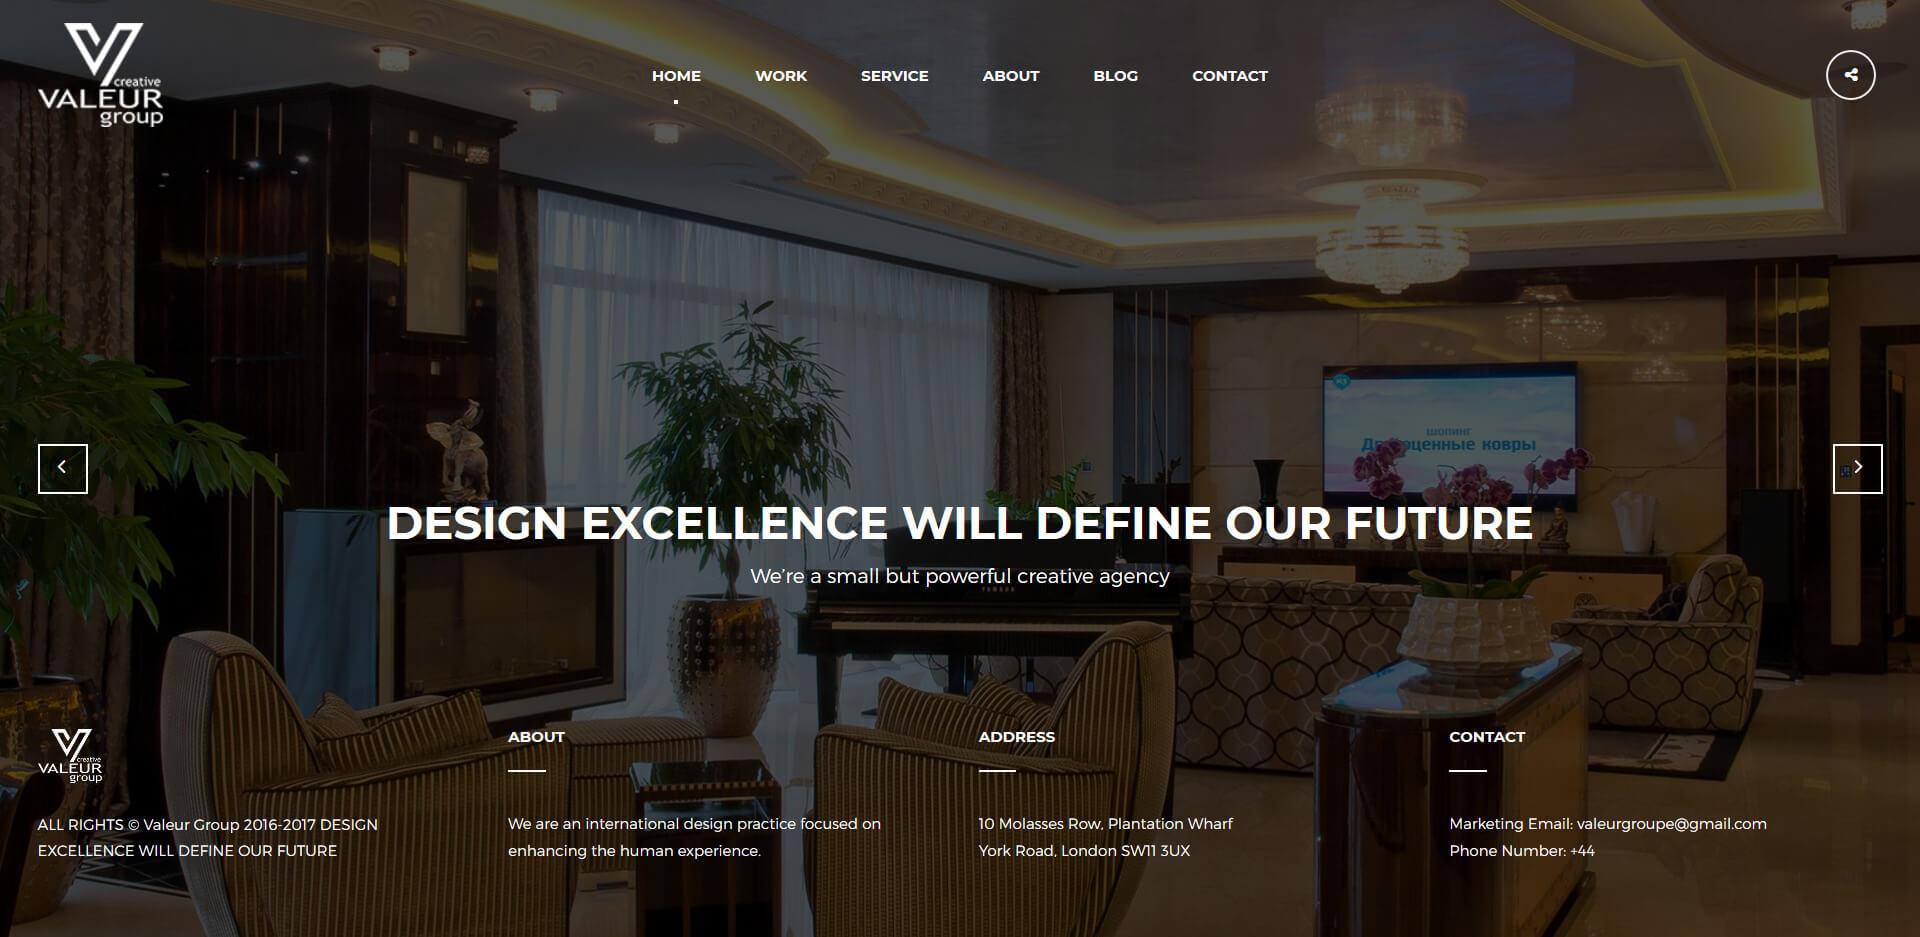 Проект Valeur Group